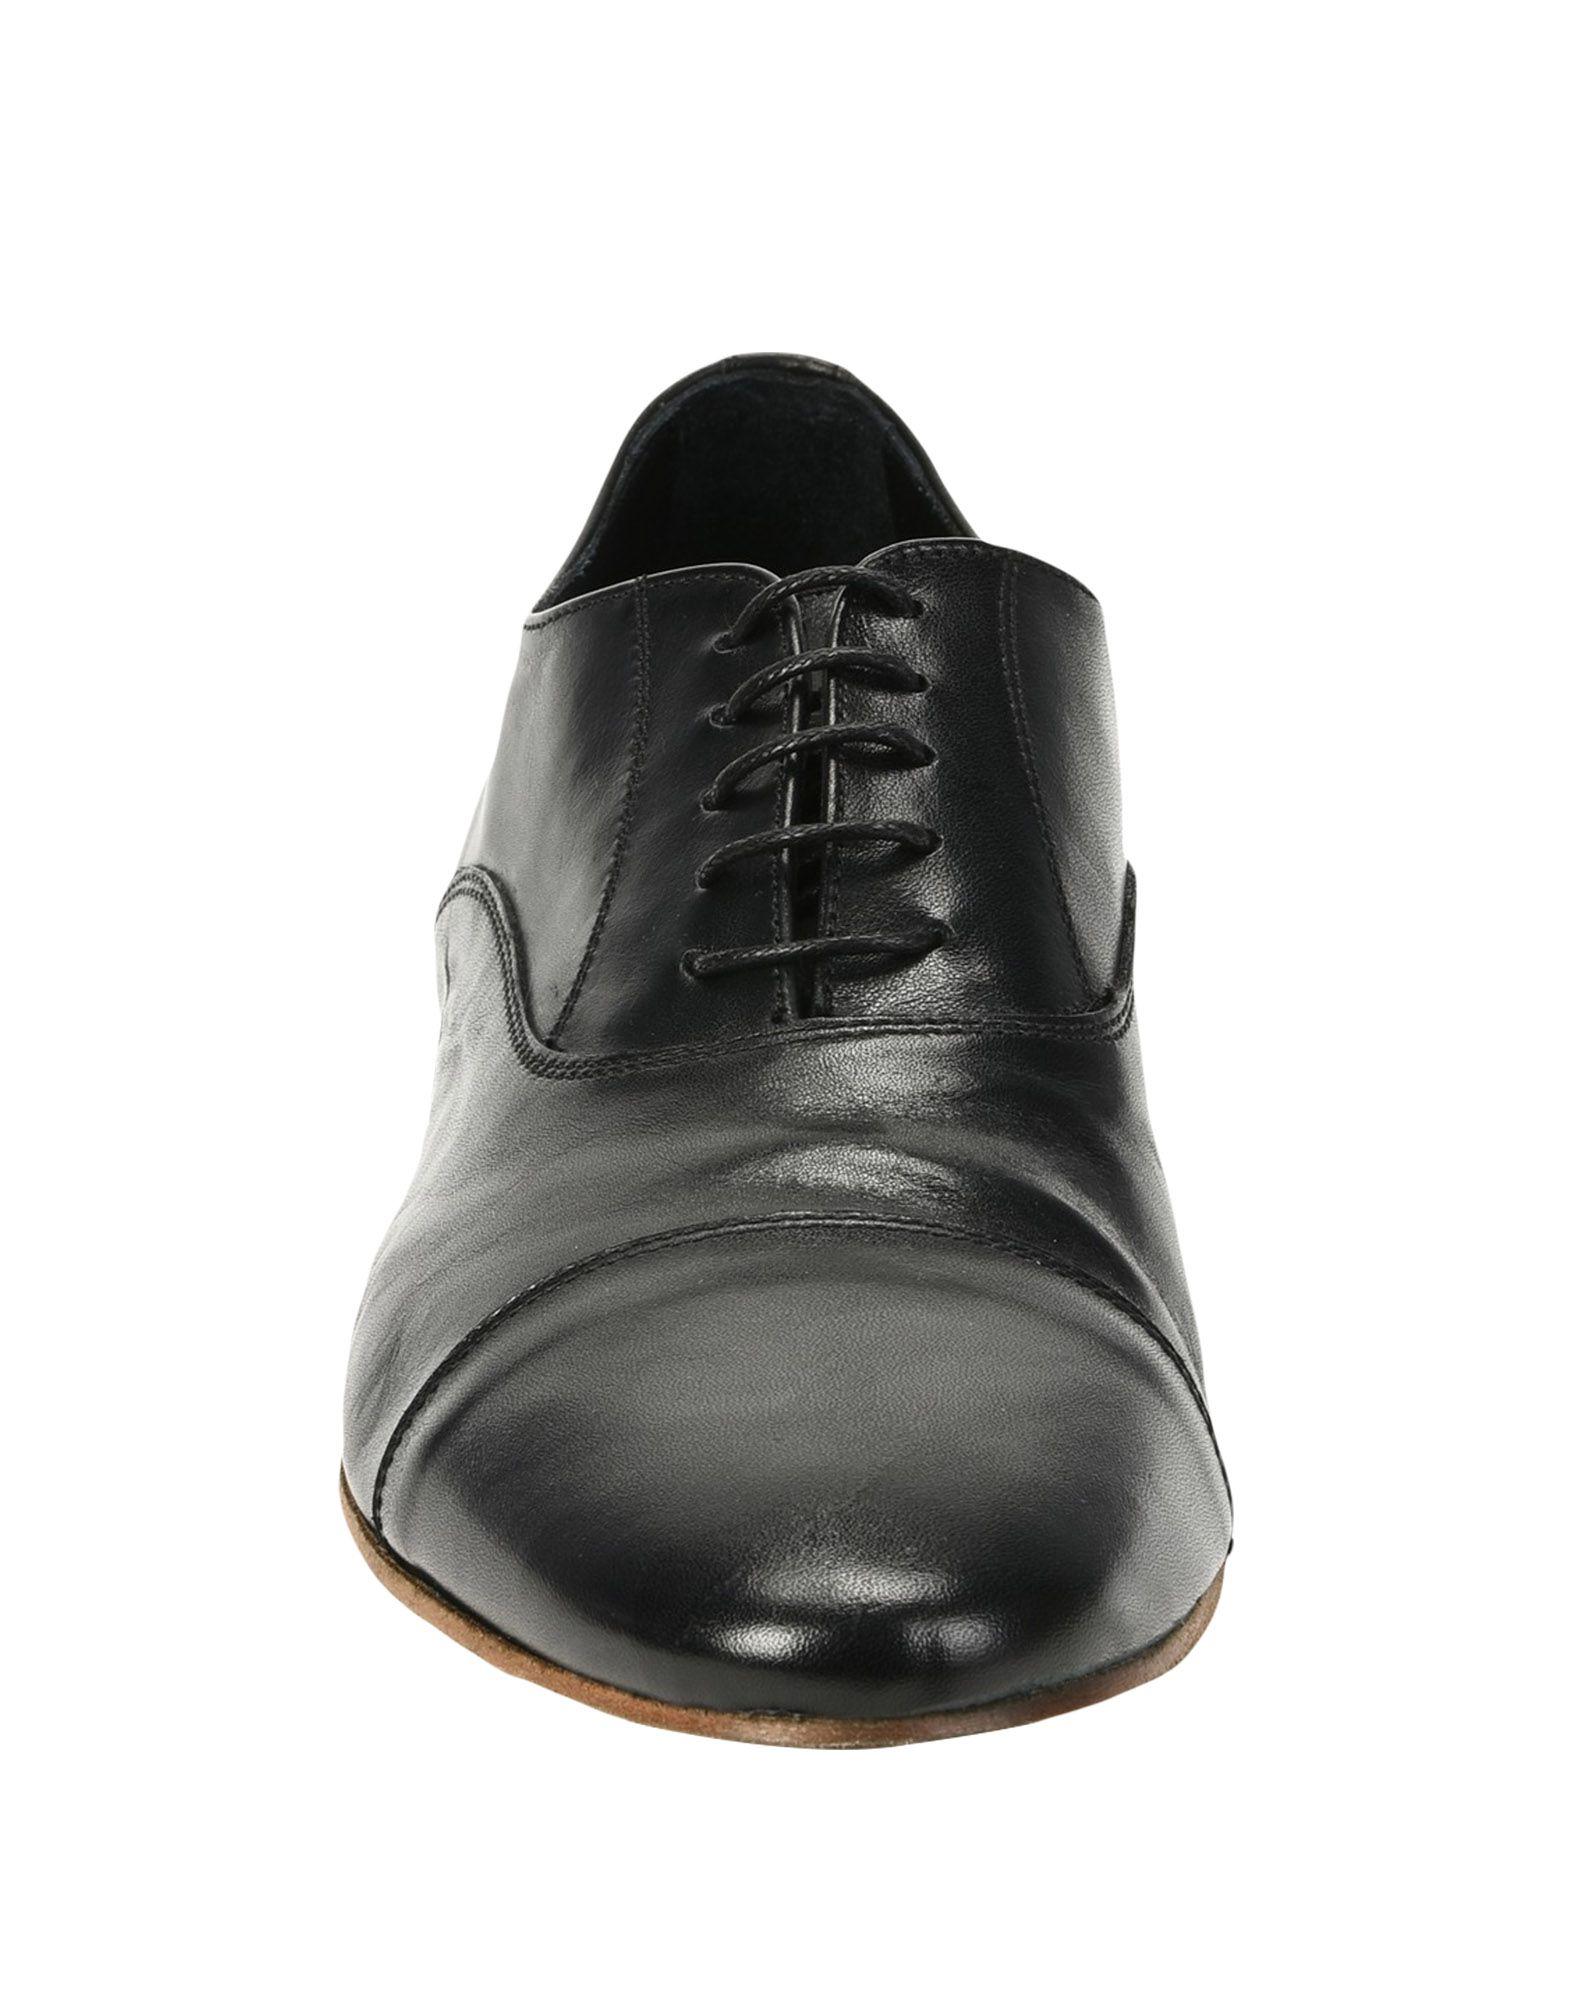 8 Schnürschuhe Herren  11457222MC Schuhe Heiße Schuhe 11457222MC ba927c